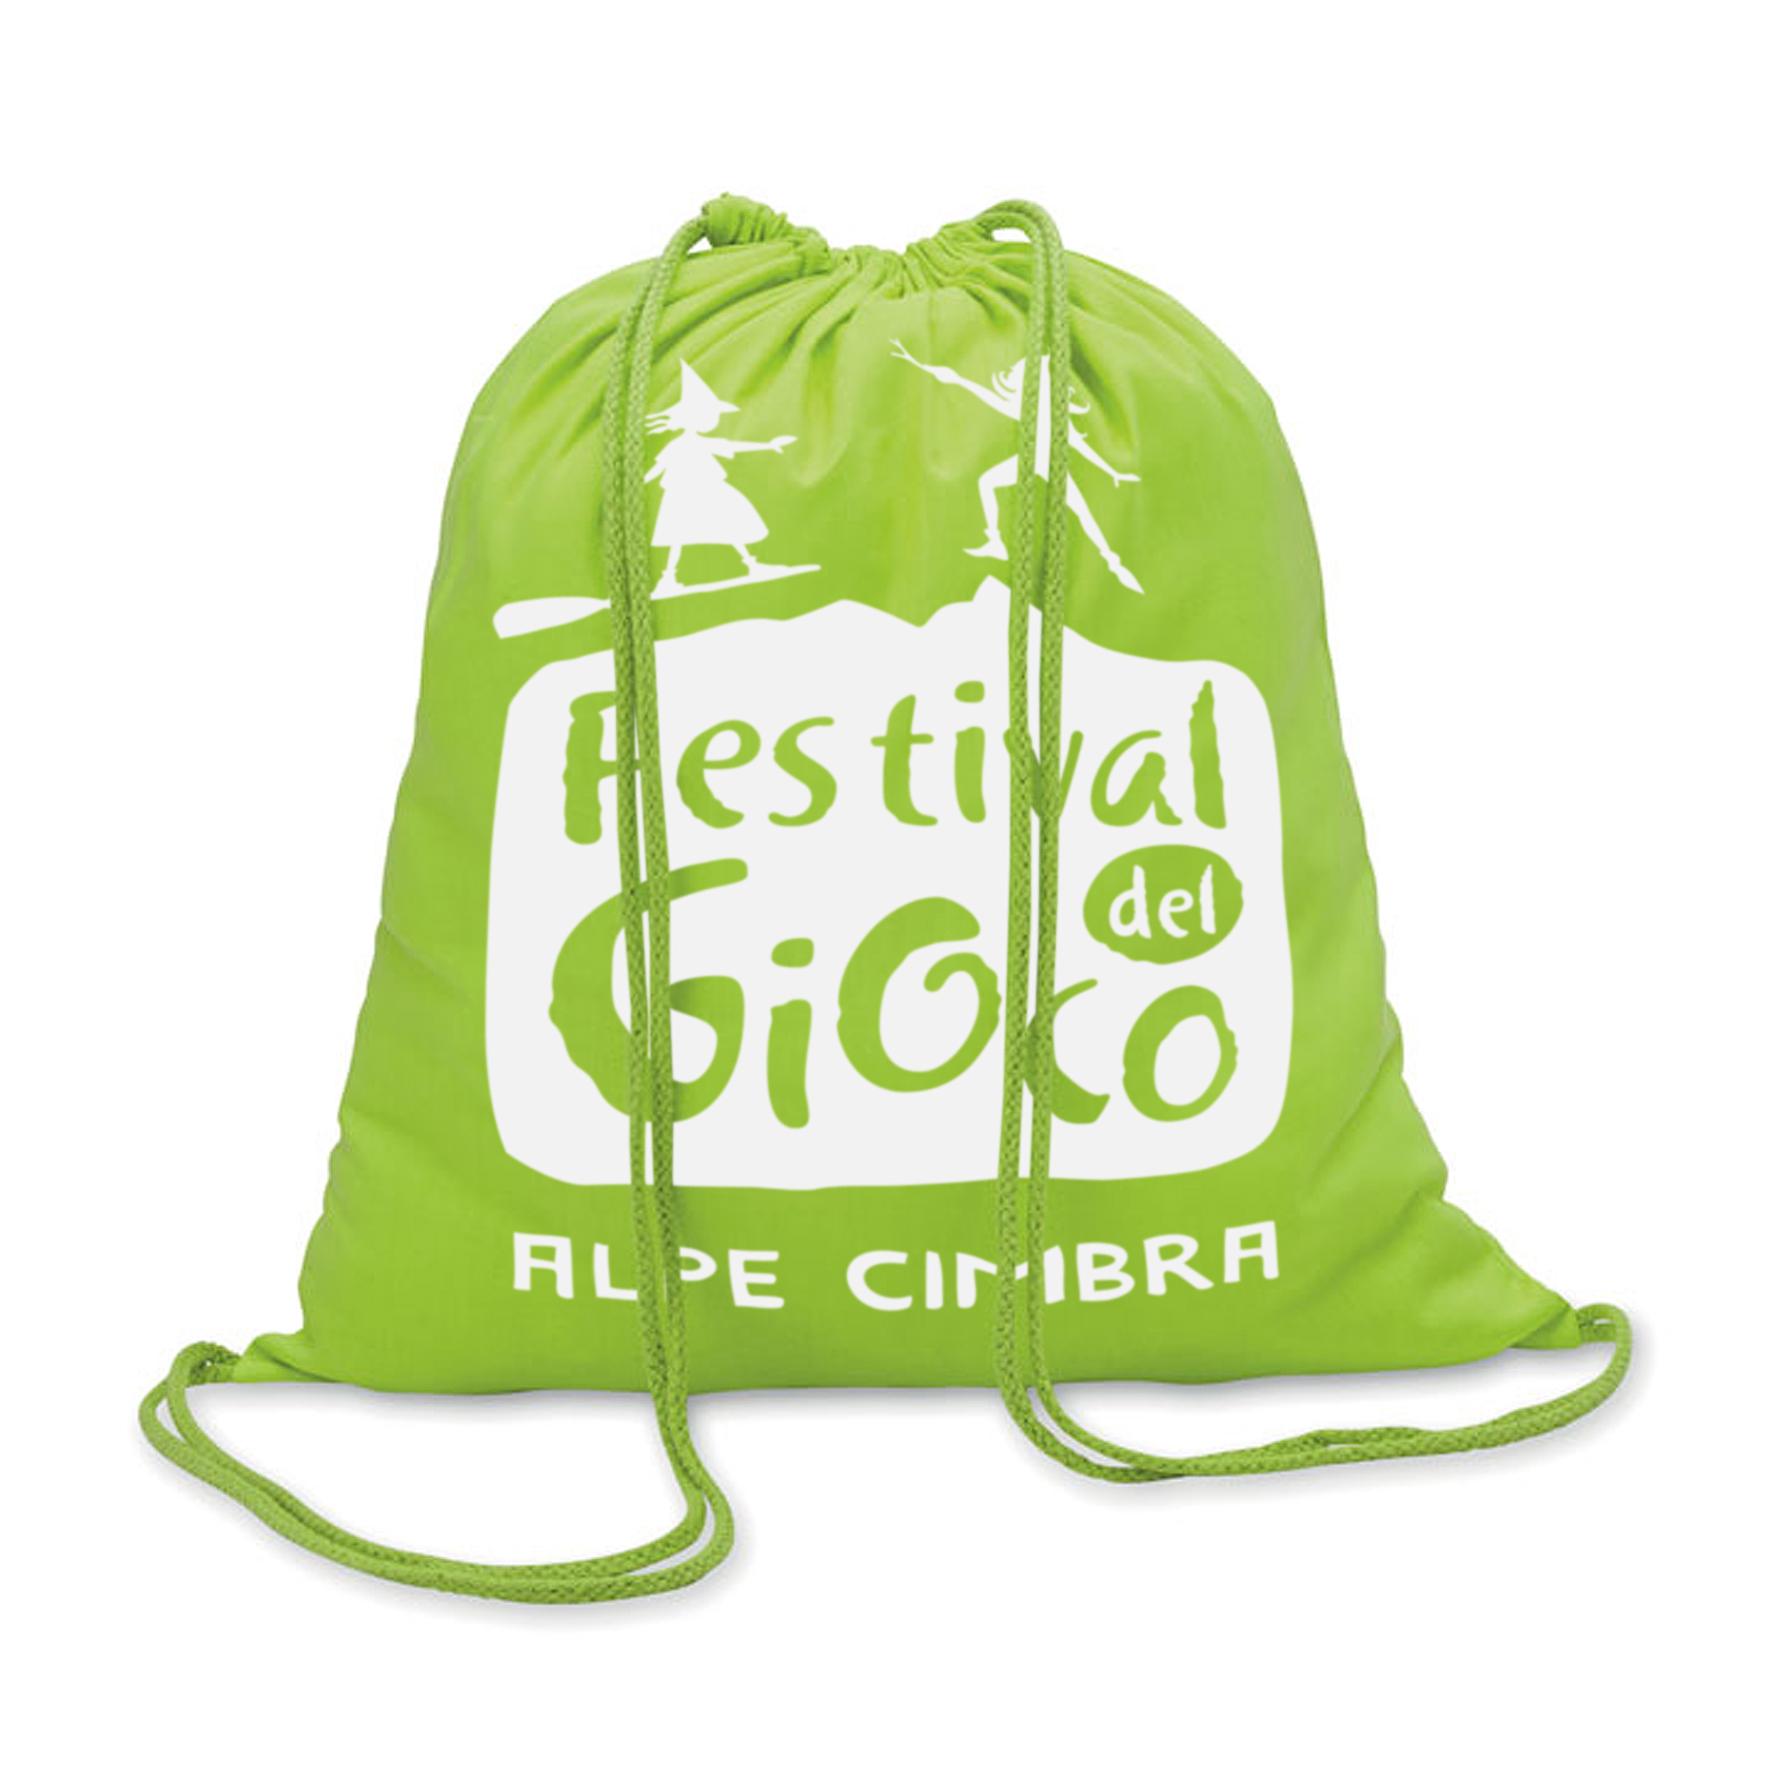 sacca-festival-gioco-alpe-cimbra